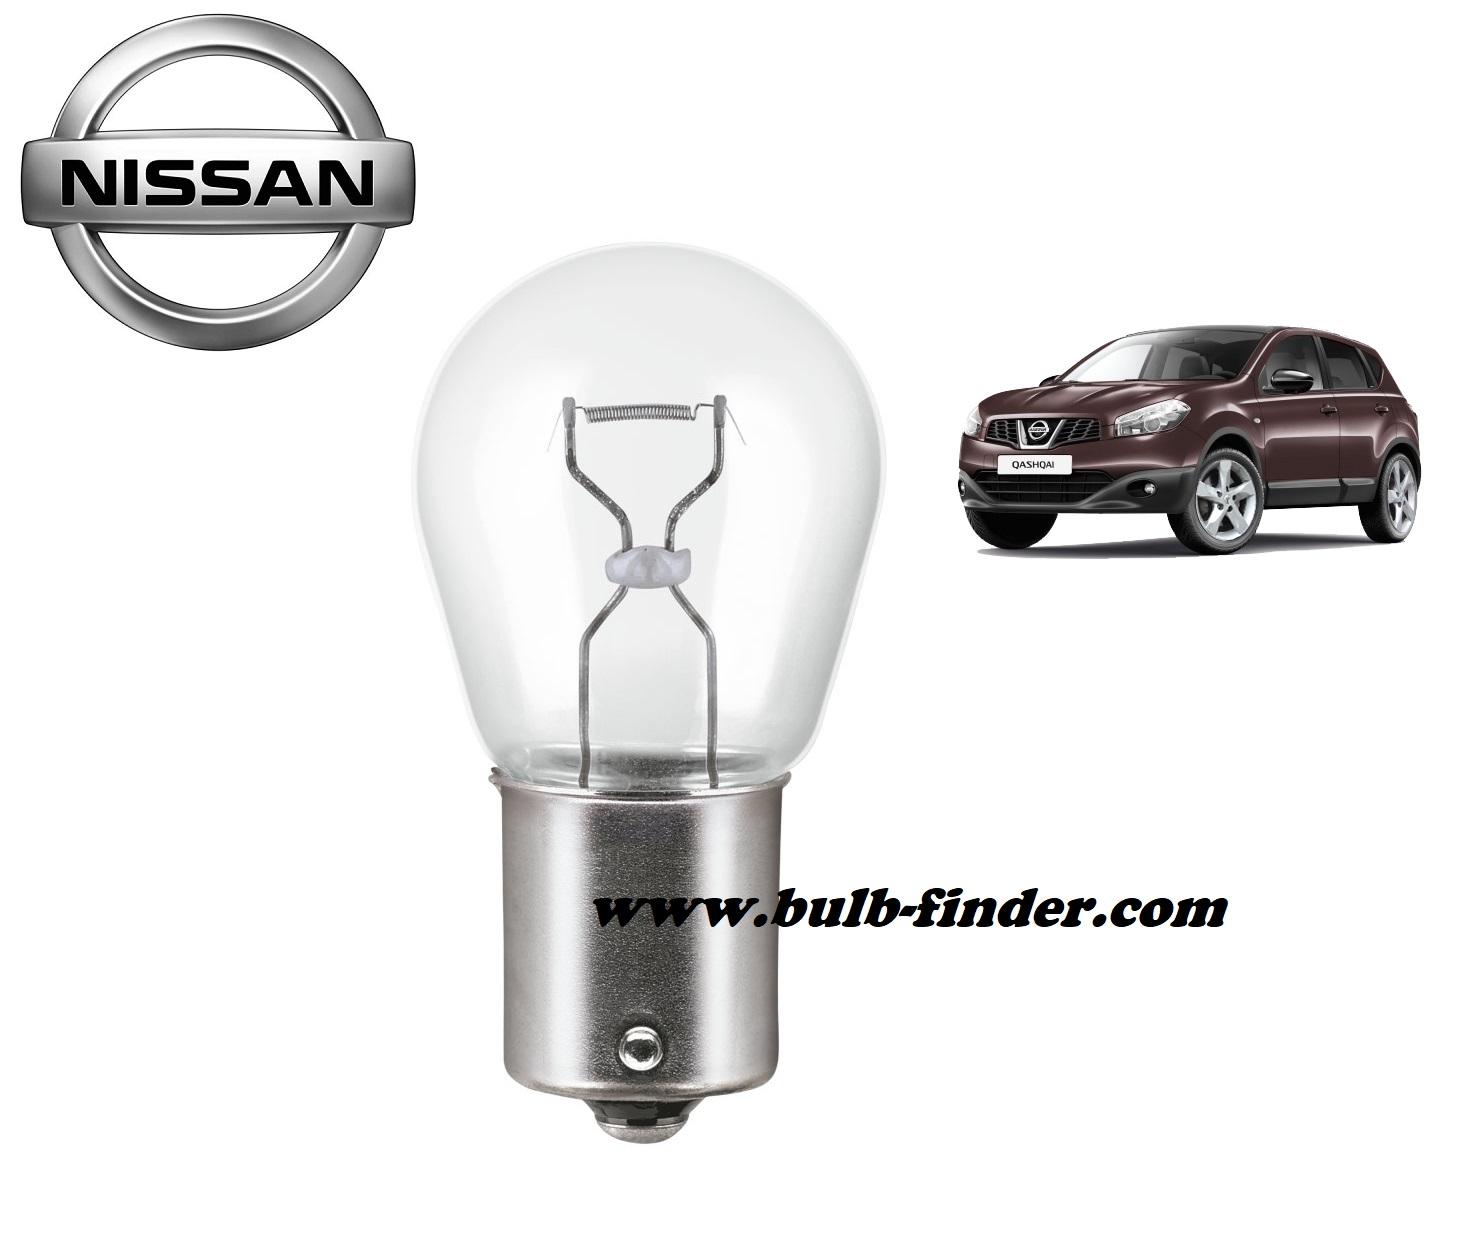 Nissan Qashqai bulb model for driving backward